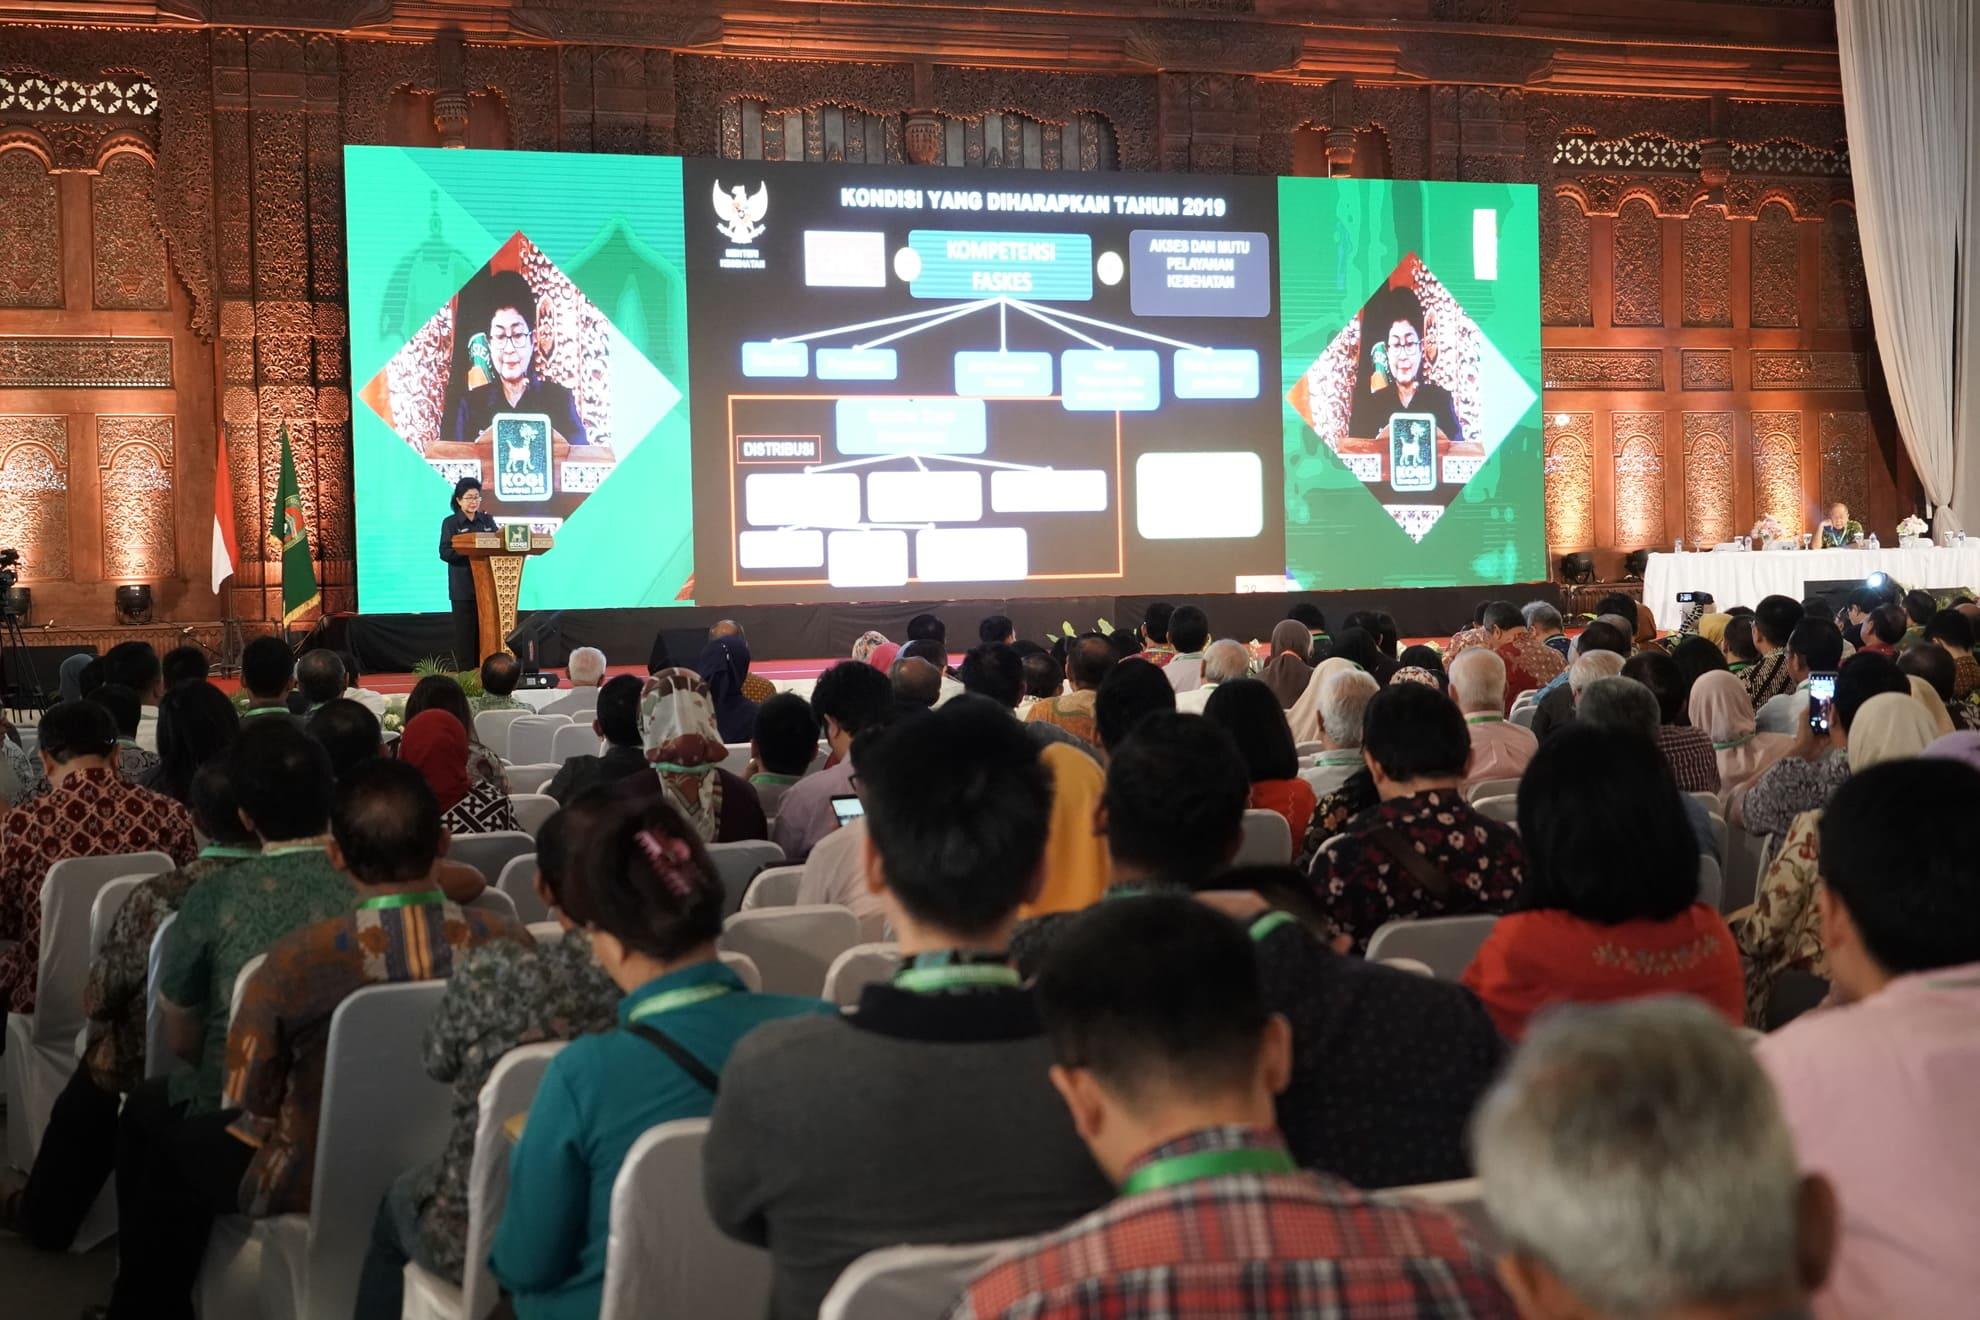 24-7-2018-keynote-speech-menkes-pd-kongres-obsetri-dan-ginekologi-indonesia-2018-di-semarang-5